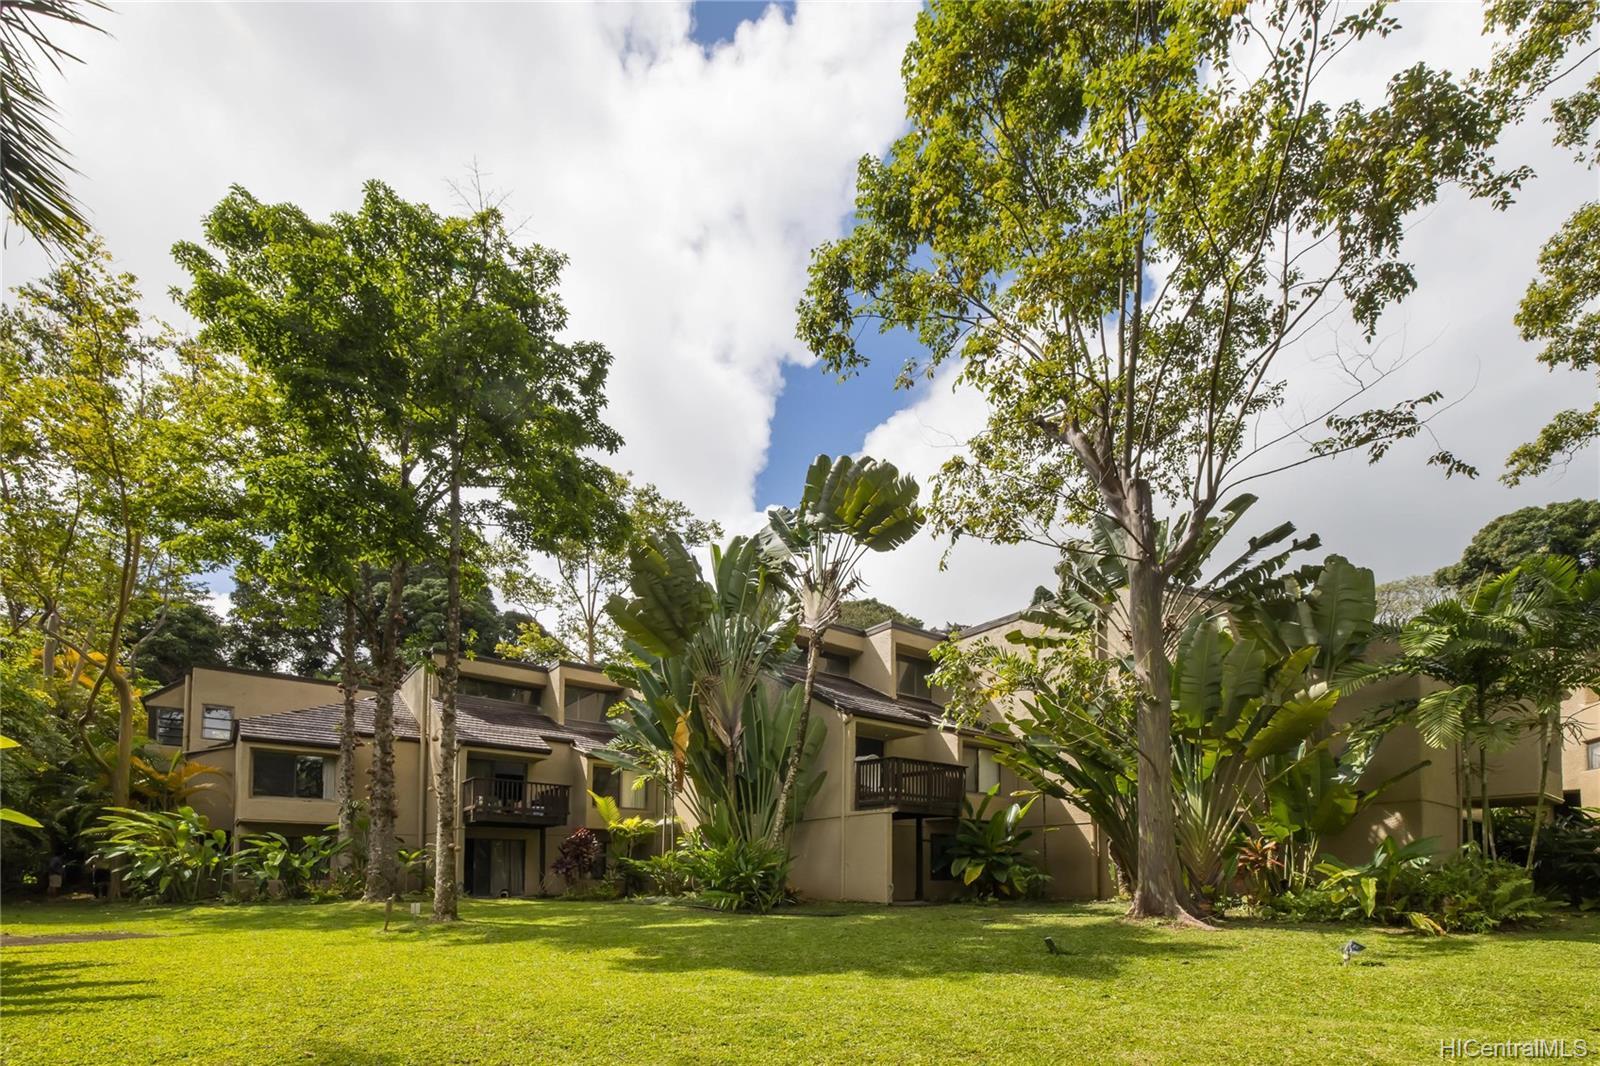 46-369 Haiku Road townhouse # H13, Kaneohe, Hawaii - photo 11 of 20